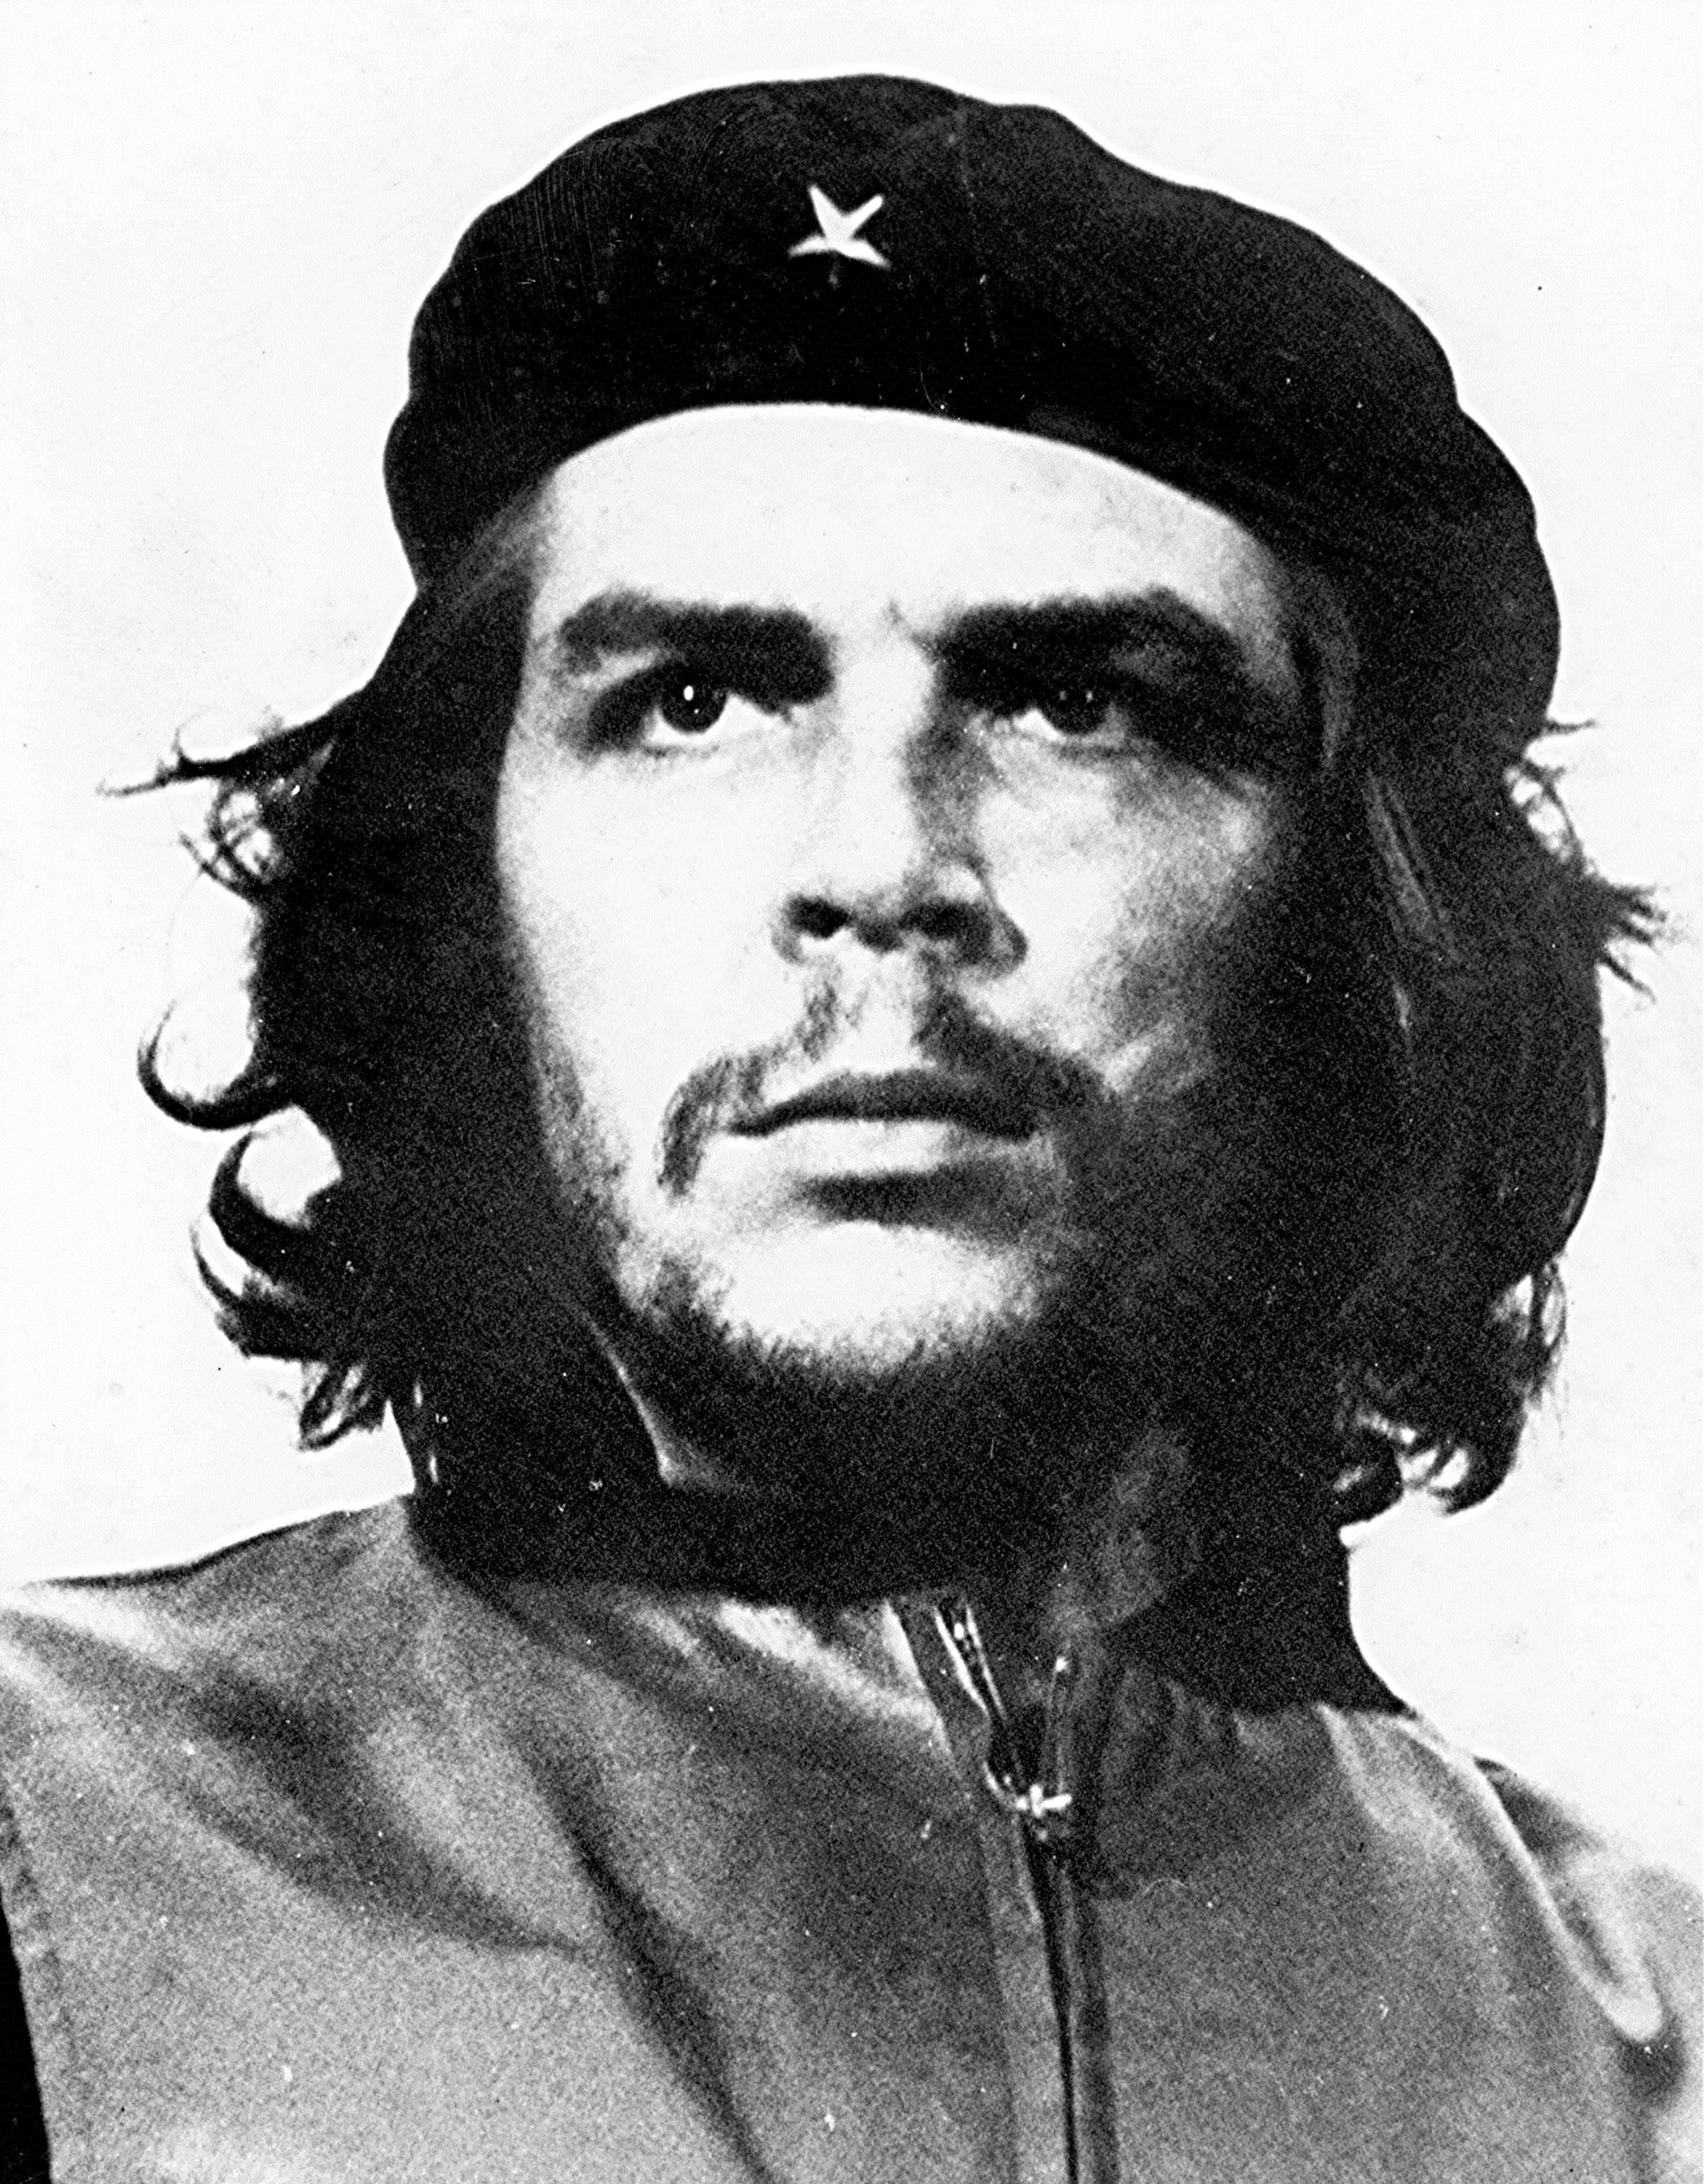 Che Guevara By Alberto Korda (Museo Che Guevara, Havana Cuba) [Public domain], via Wikimedia Commons http://commons.wikimedia.org/wiki/File%3ACheHigh.jpg